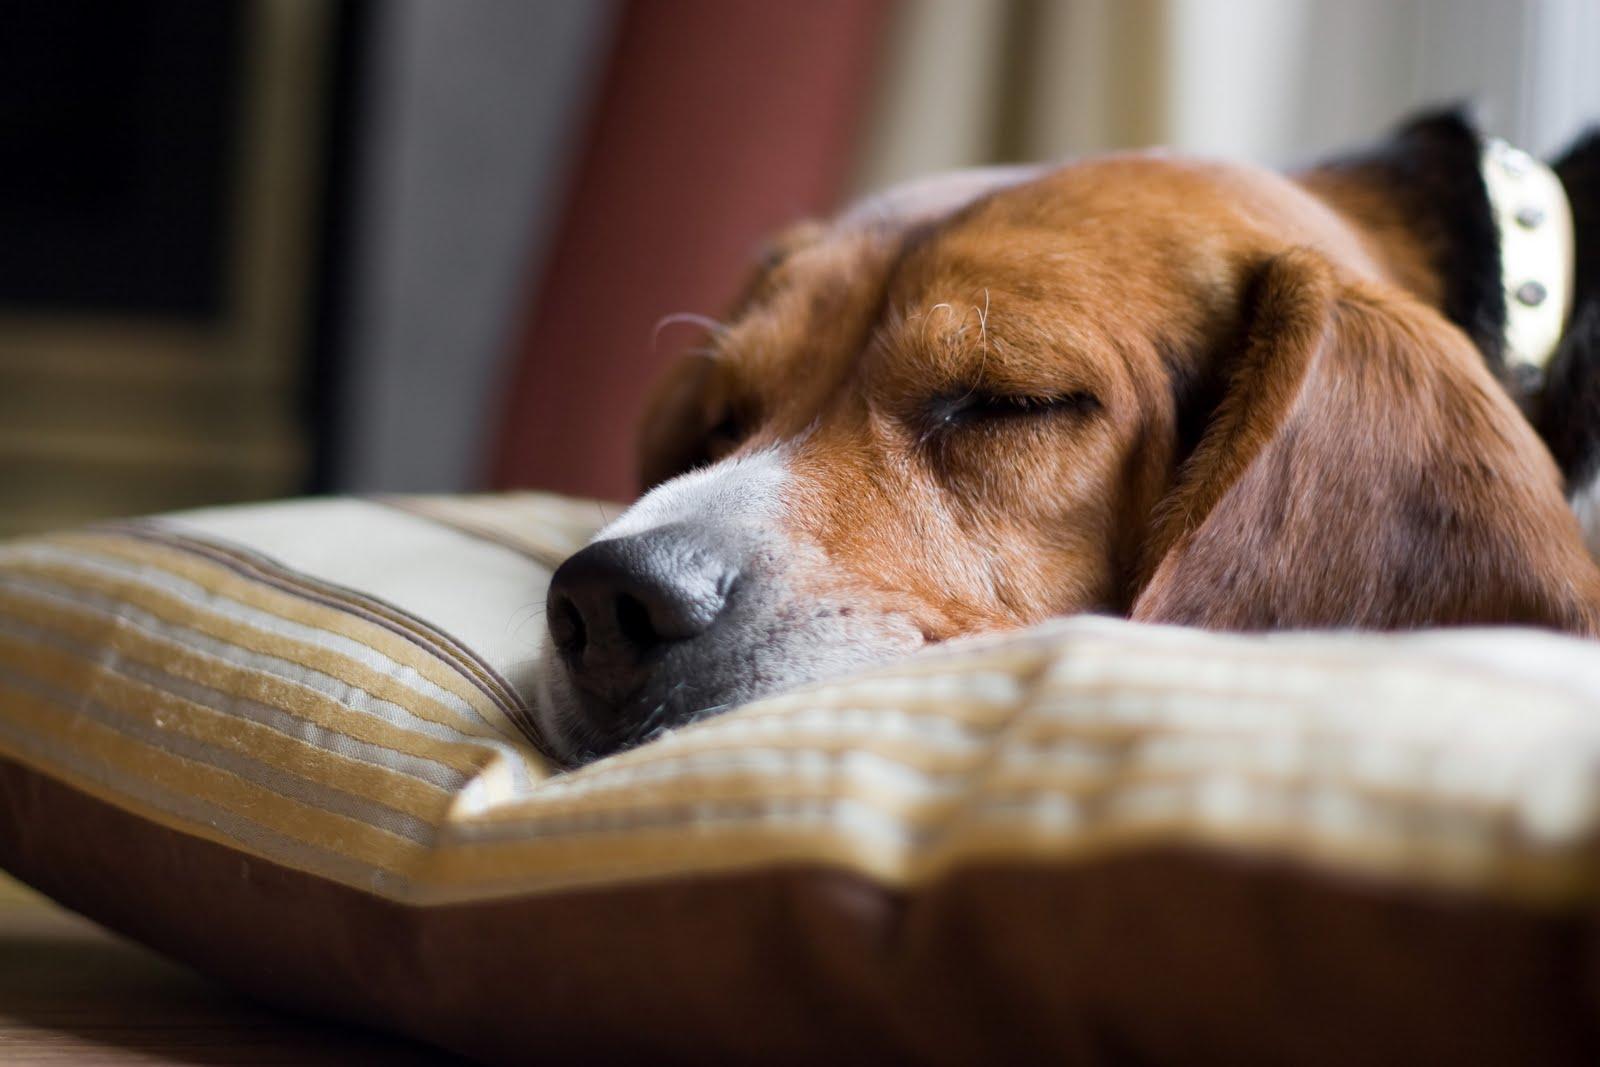 http://1.bp.blogspot.com/-9Enrynhf5SE/TdDByEx8TrI/AAAAAAAAAUQ/7yMfVtmHVaM/s1600/Cute+Dogs+Pictures+Wallpapers+%25283%2529.jpg